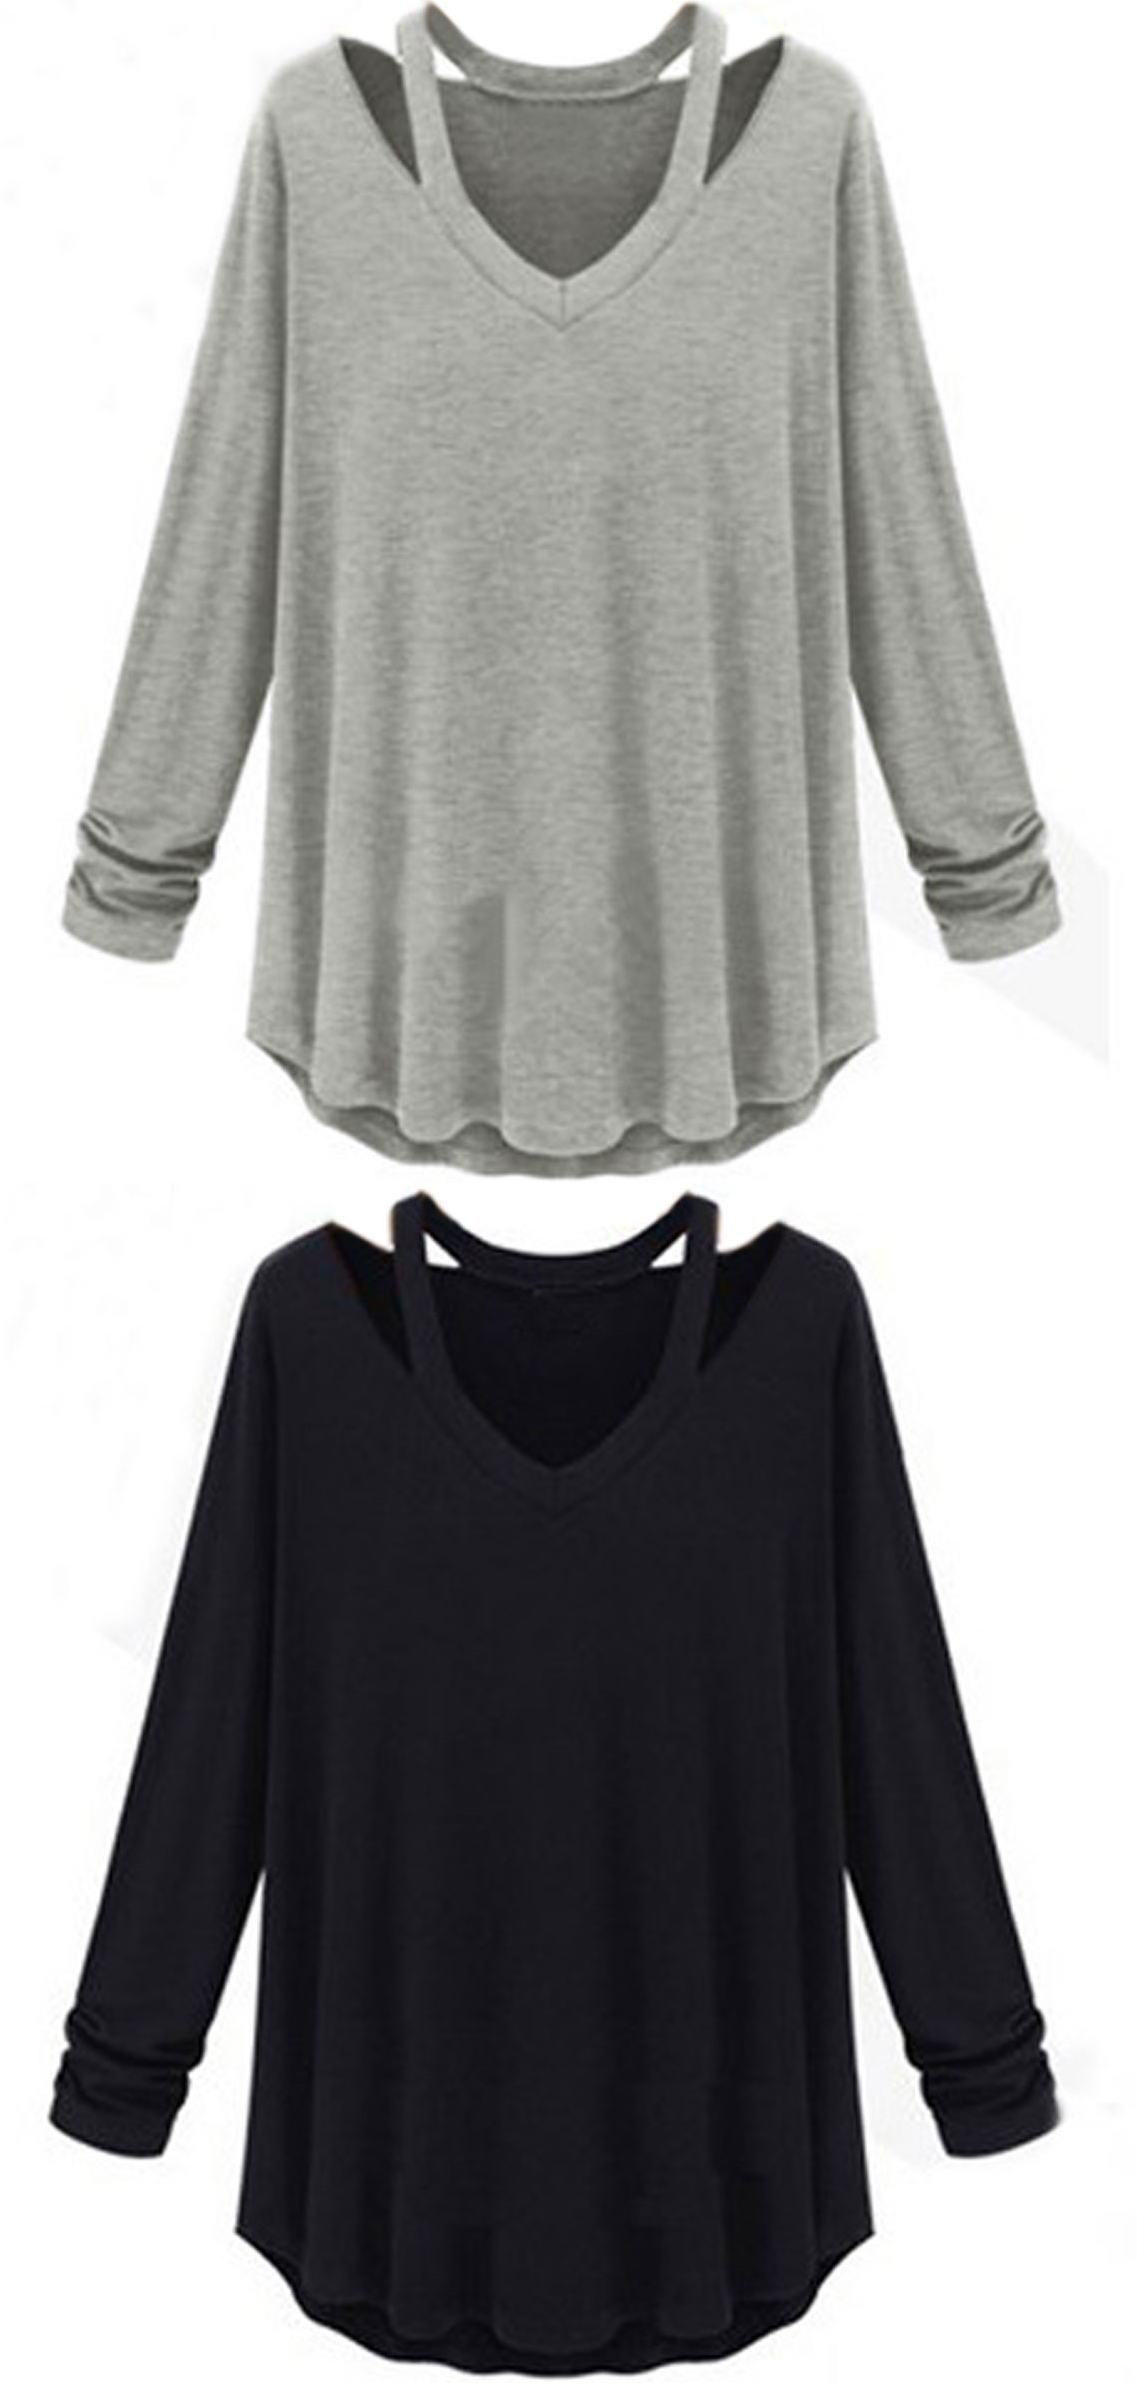 4dda5a053a4 Women Long Sleeve V Neck Off Shoulder Loose T-shirt | NC Women's ...